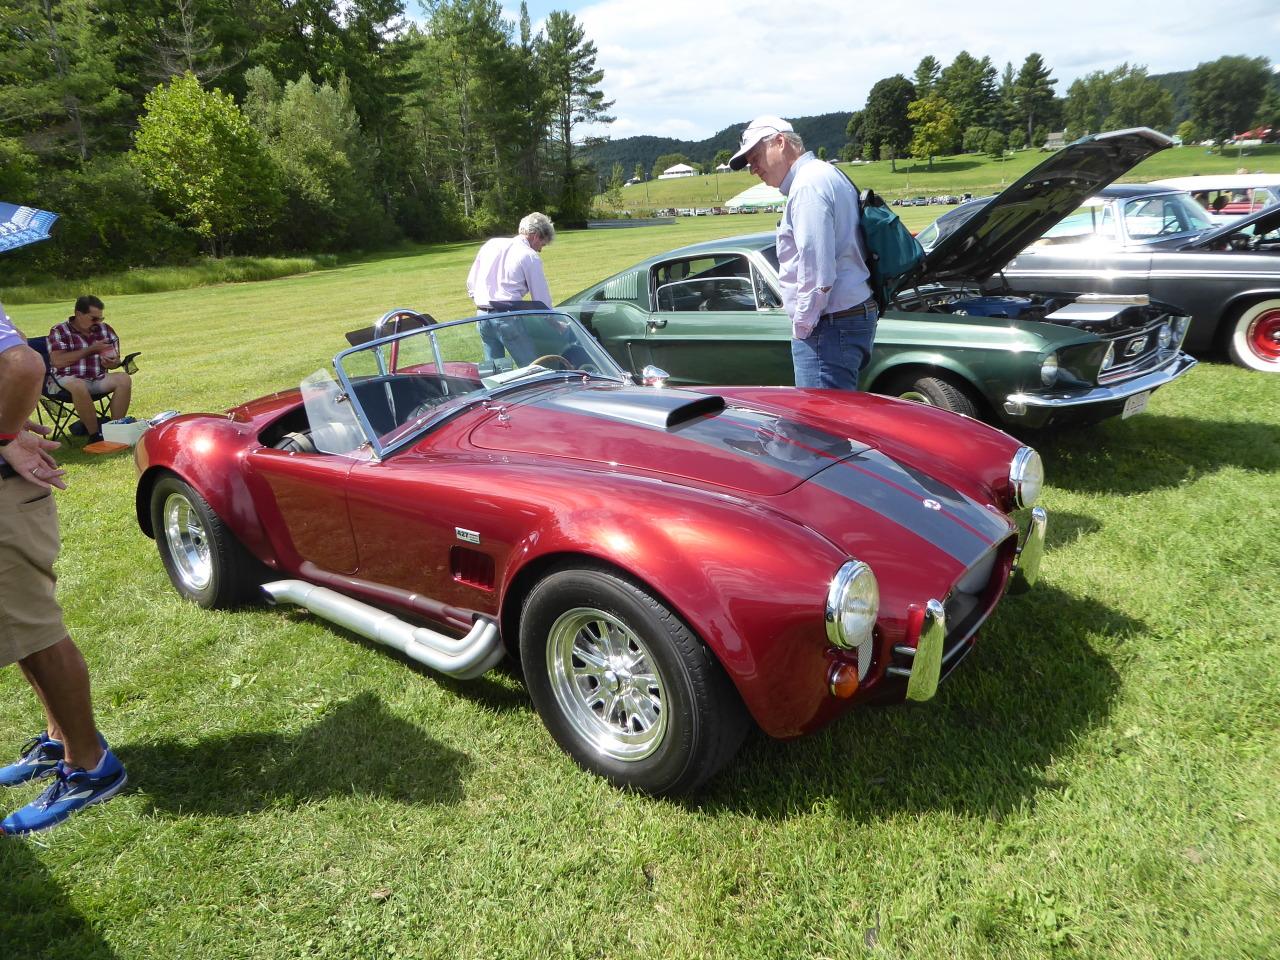 Shelby Cobra replica #classic#muscle#replica#kit#continuation#car#cars#auto#car show#ac#shelby#cobra#lime rock